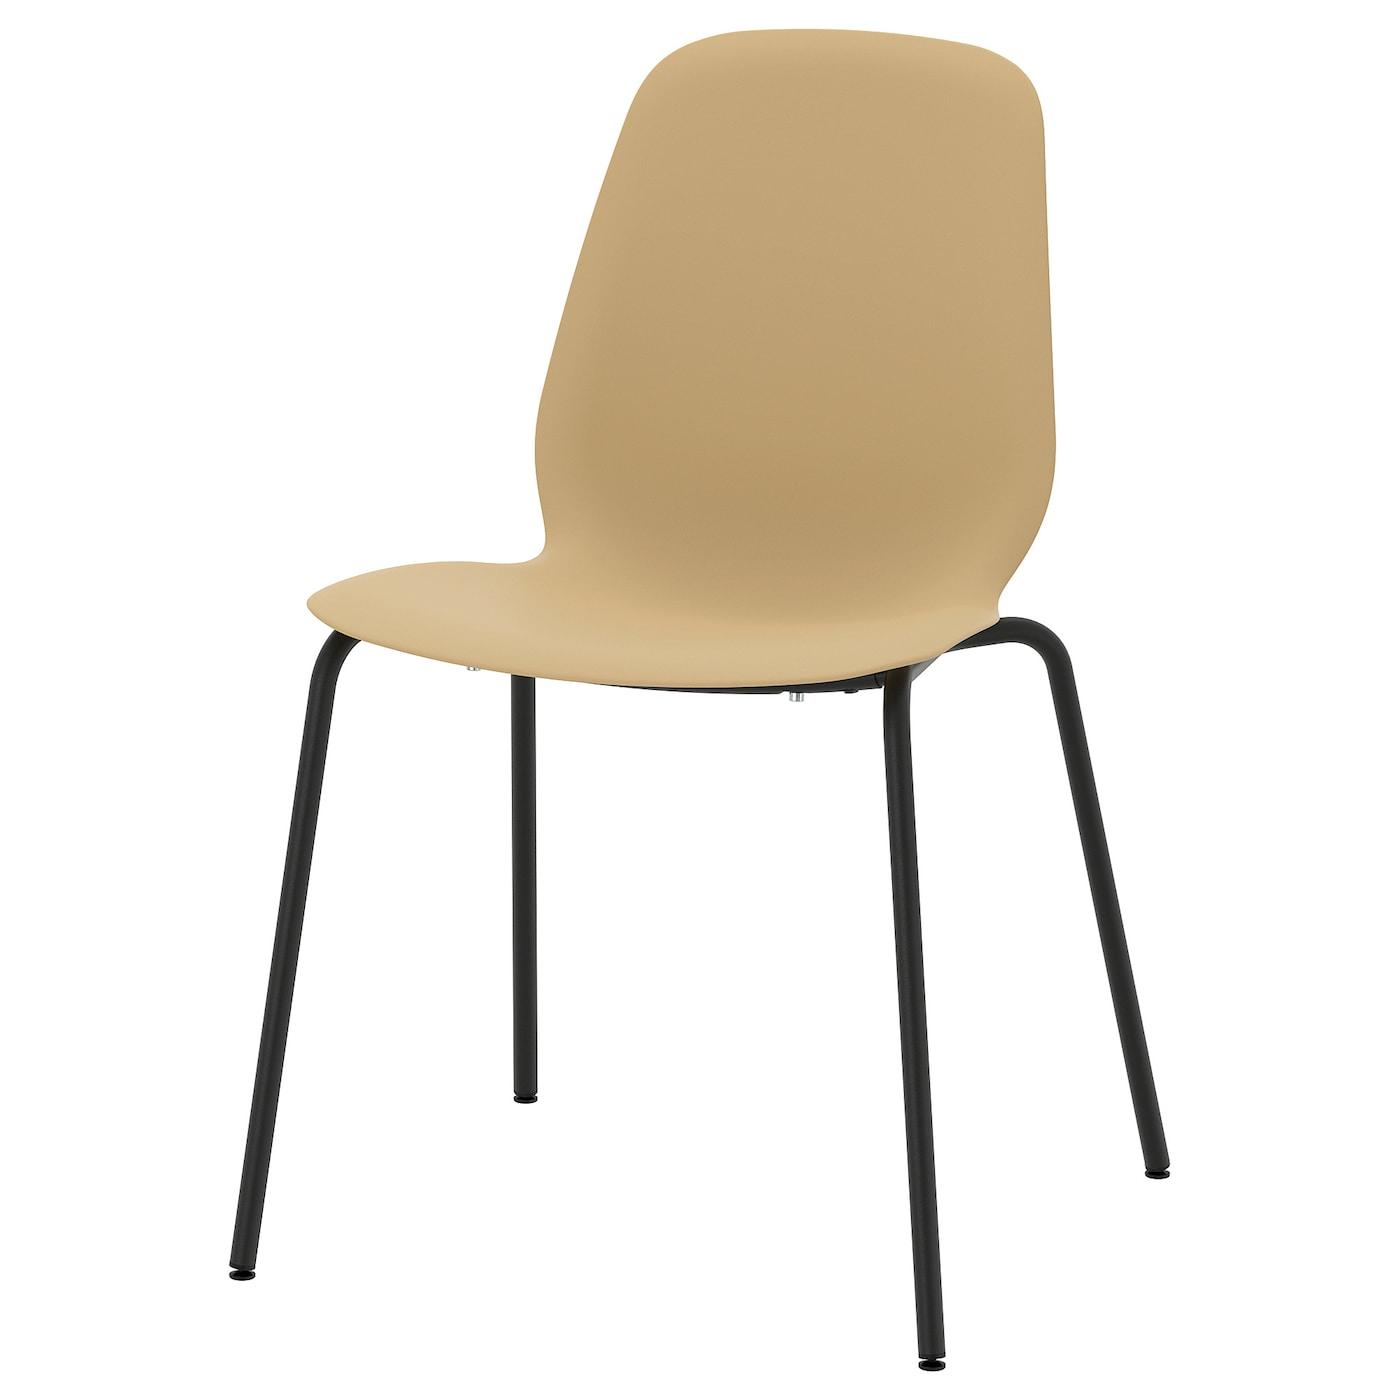 LEIFARNE Chaise, vert olive clair, Broringe noir IKEA